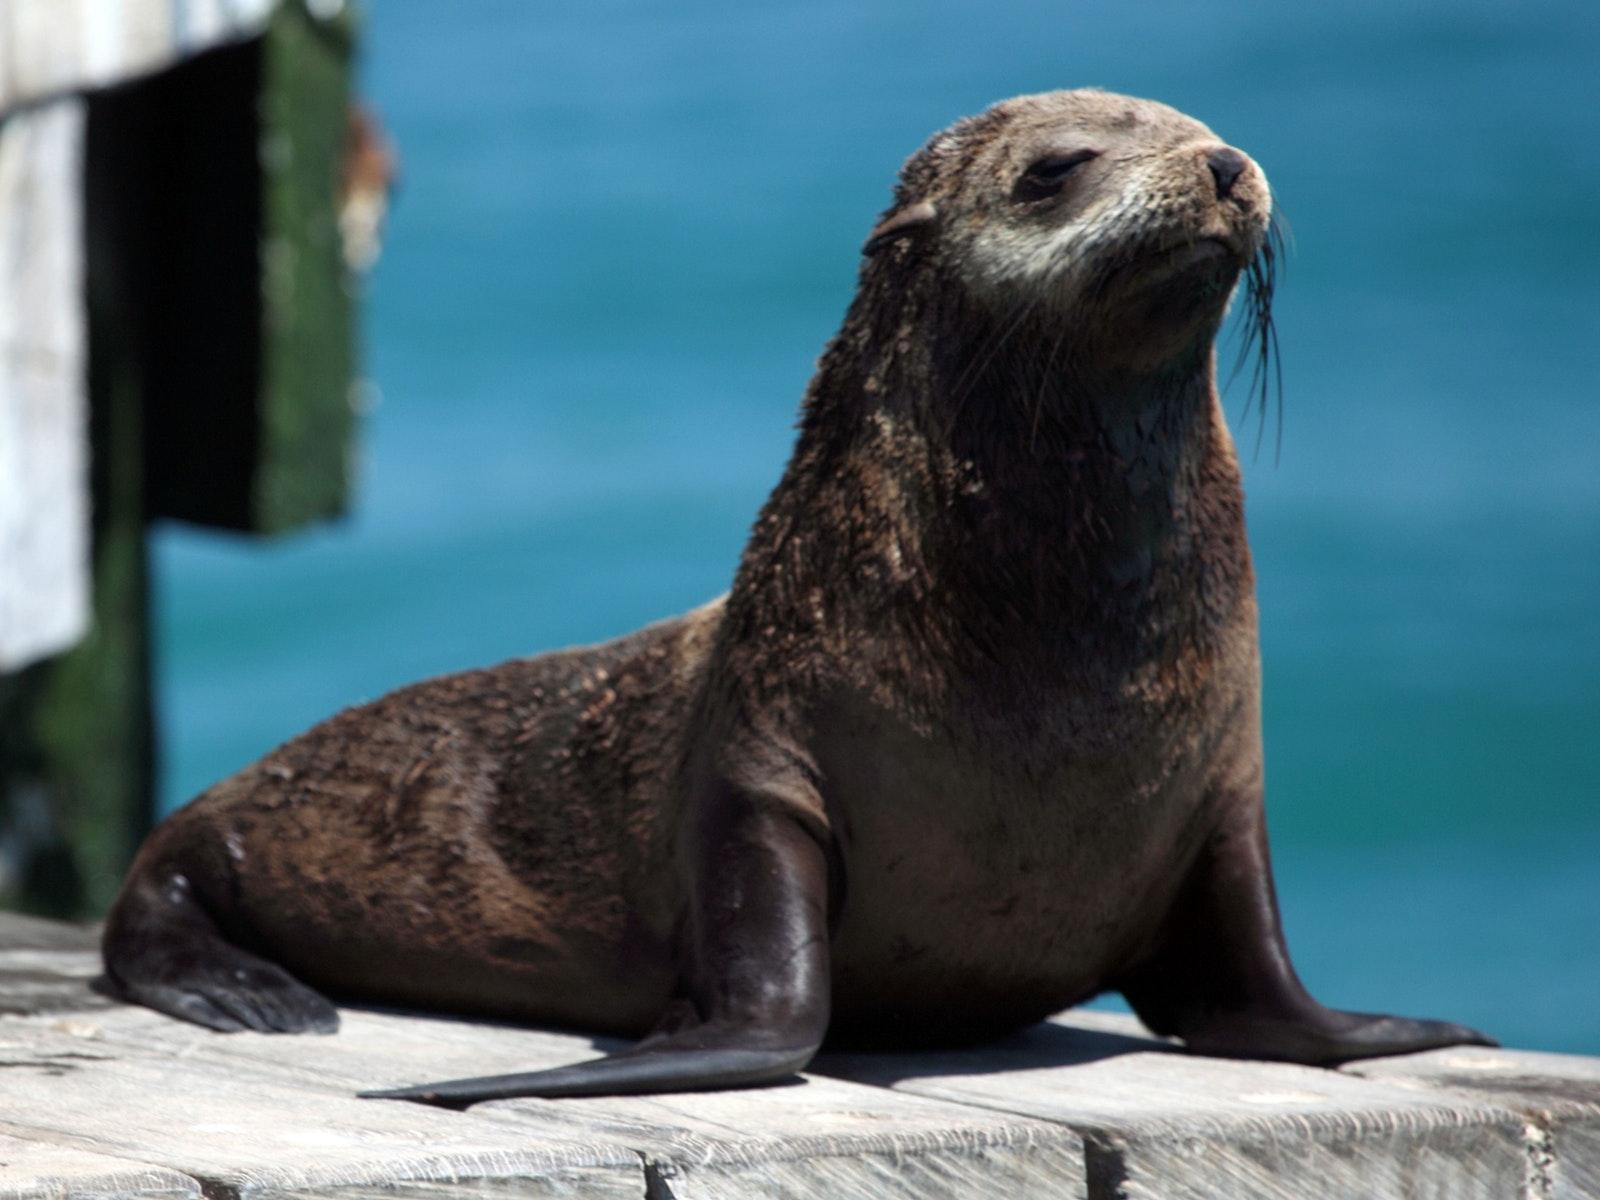 Australiasian Fur Seals